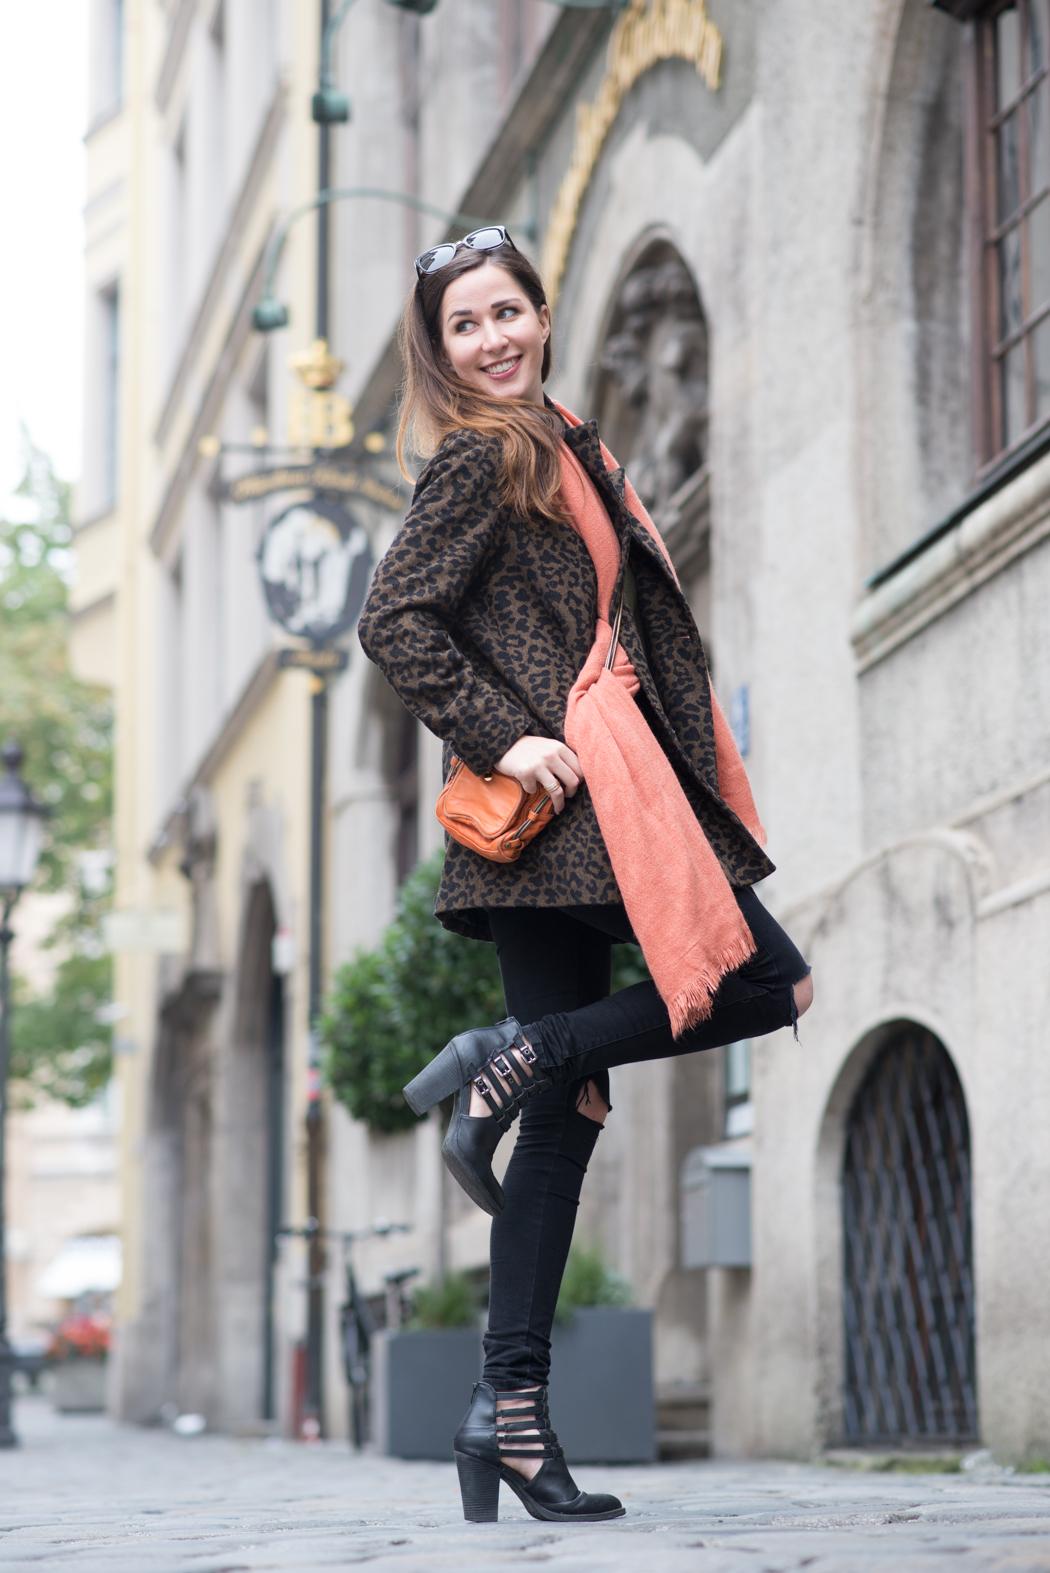 Münchner-Fashionblog-Alexander-Wang-Bag-Leomantel-4